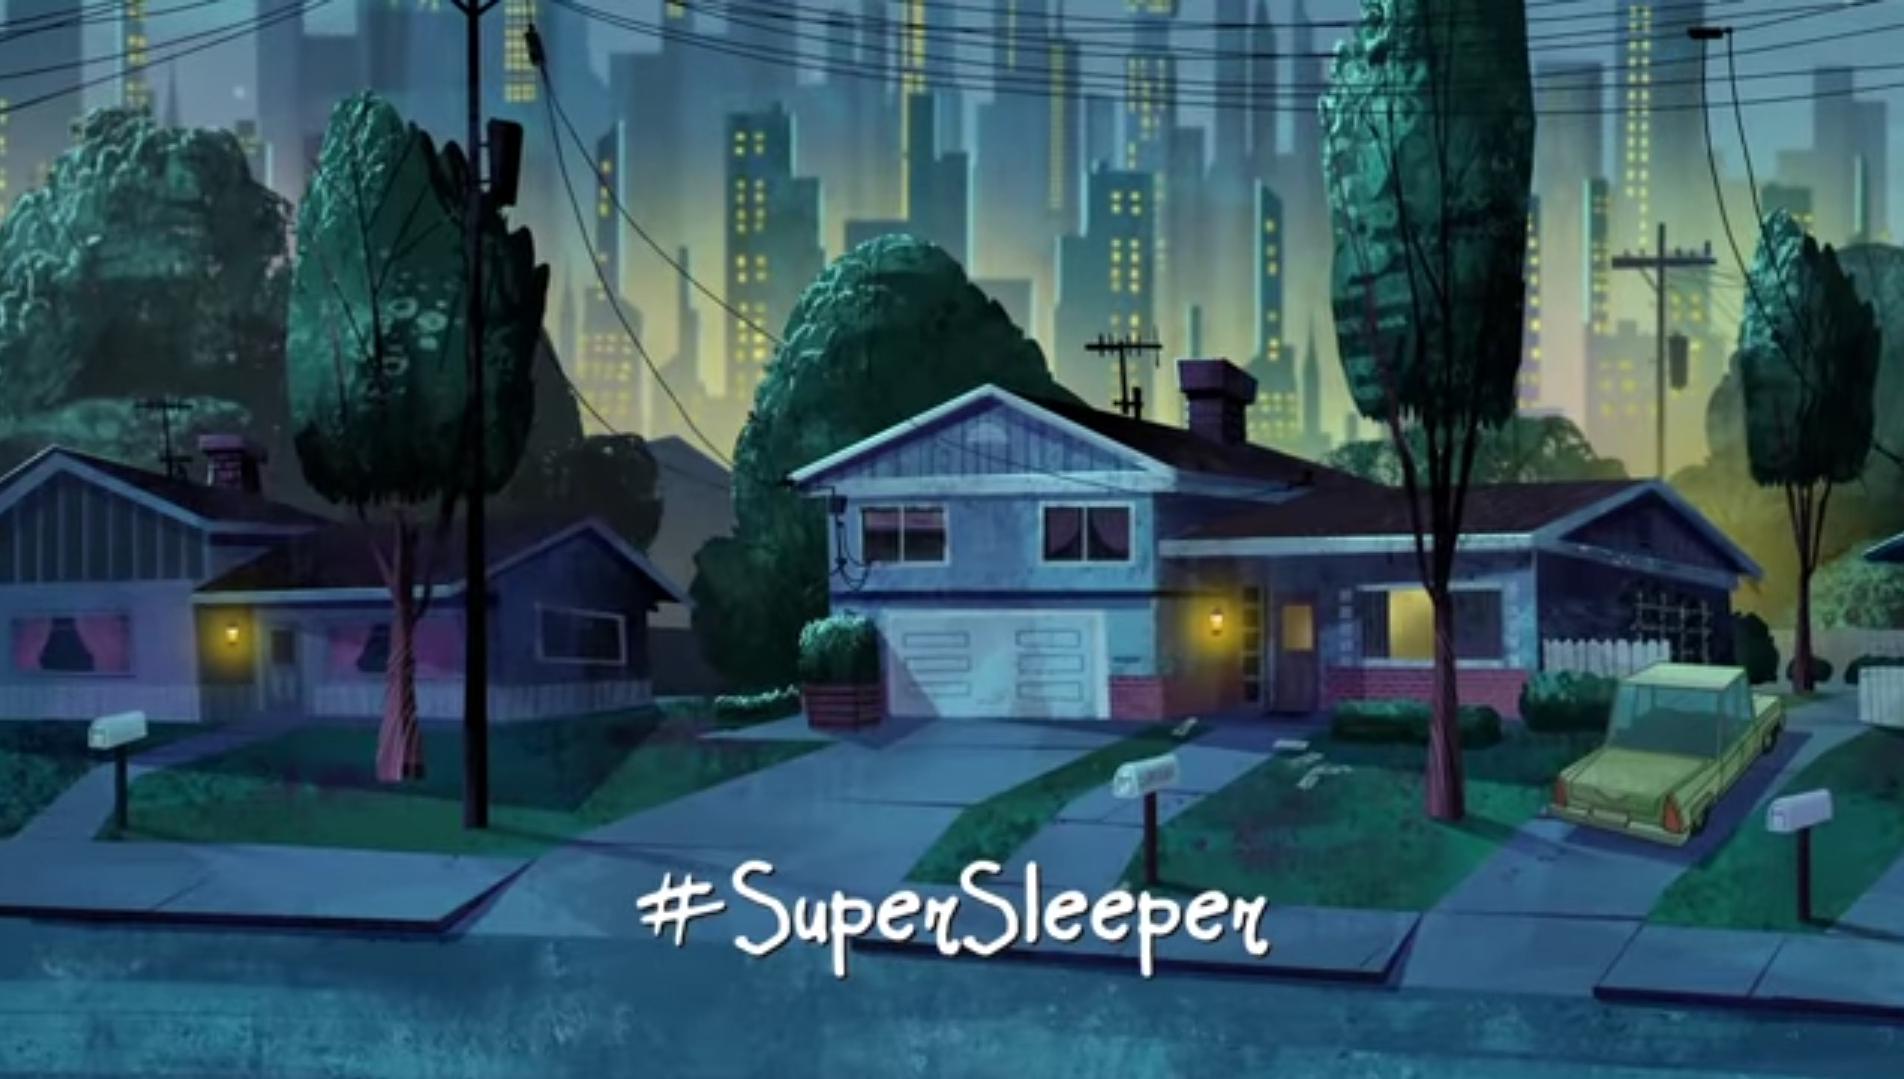 Super Sleeper